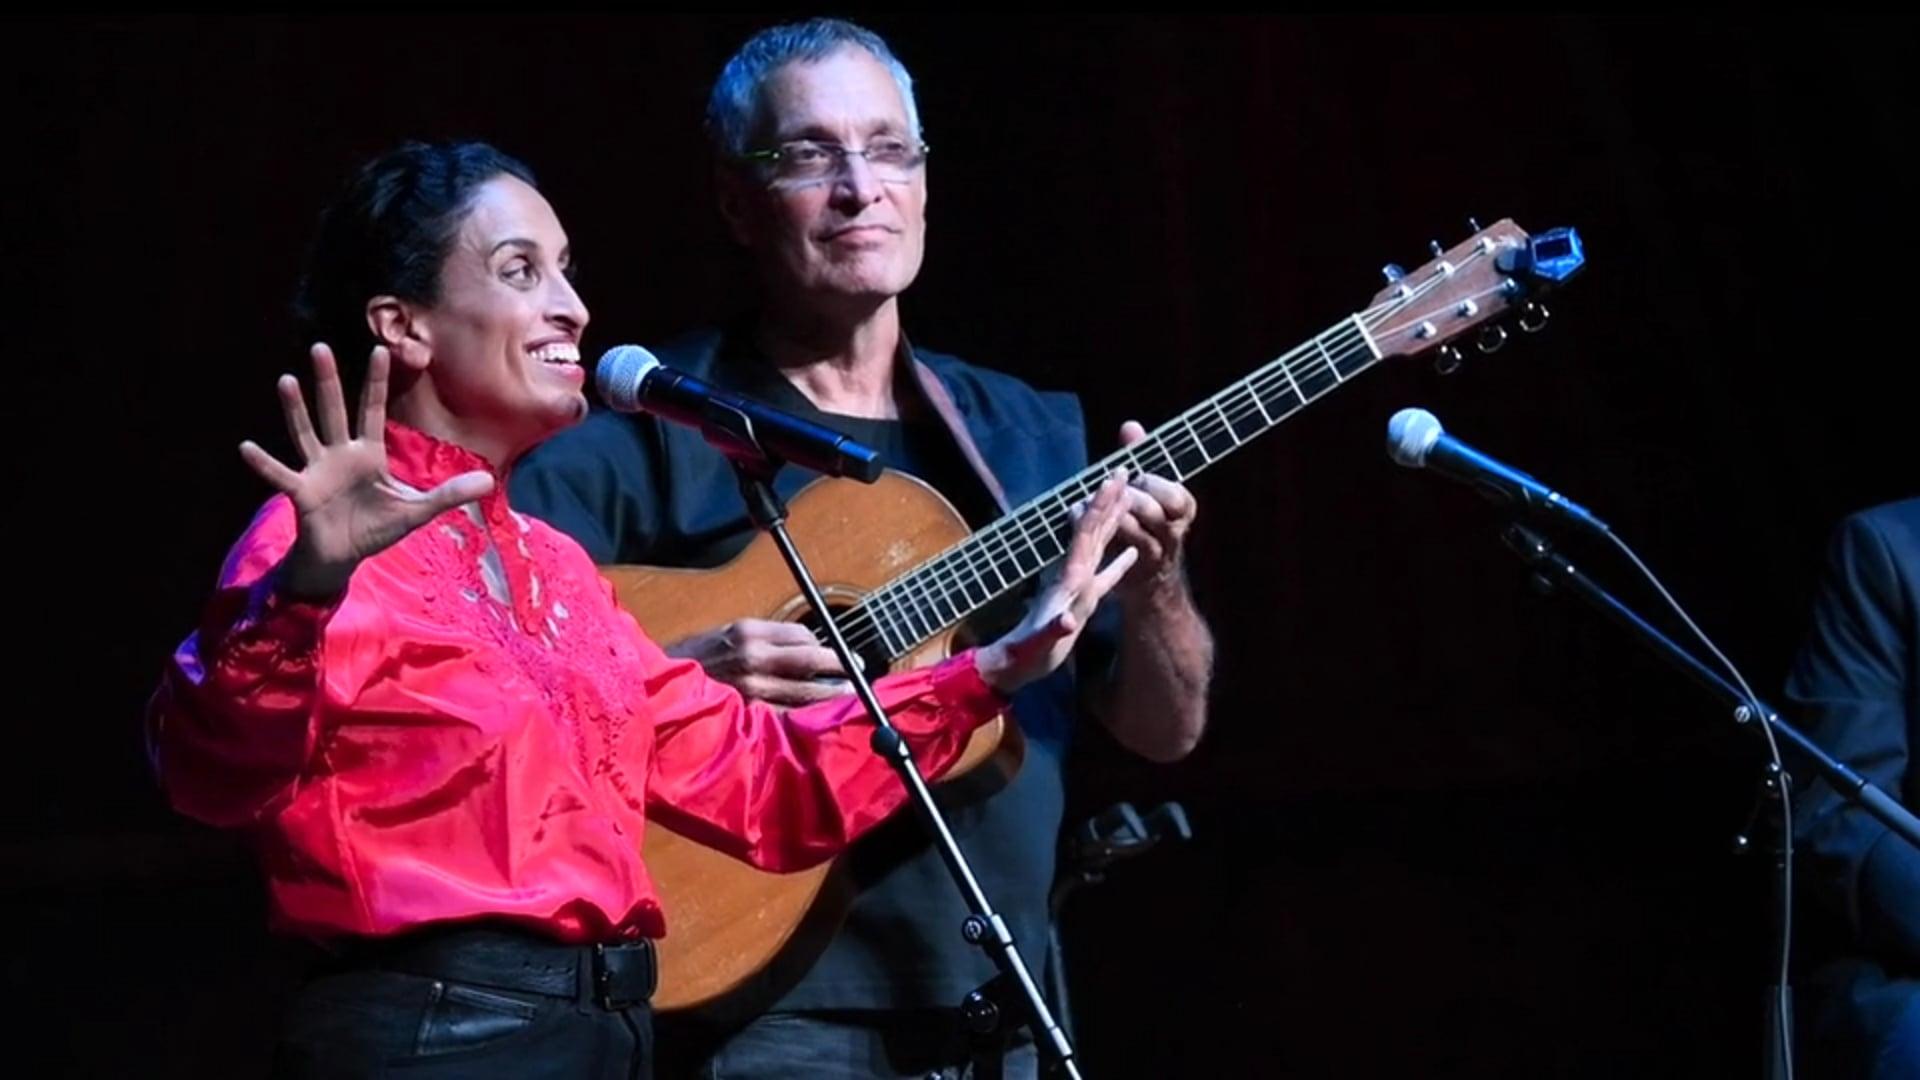 Noa (Achinoam Nini) & Gil Dor - Little lovin' - Heichal Hatarbut, with Yoav Kutner